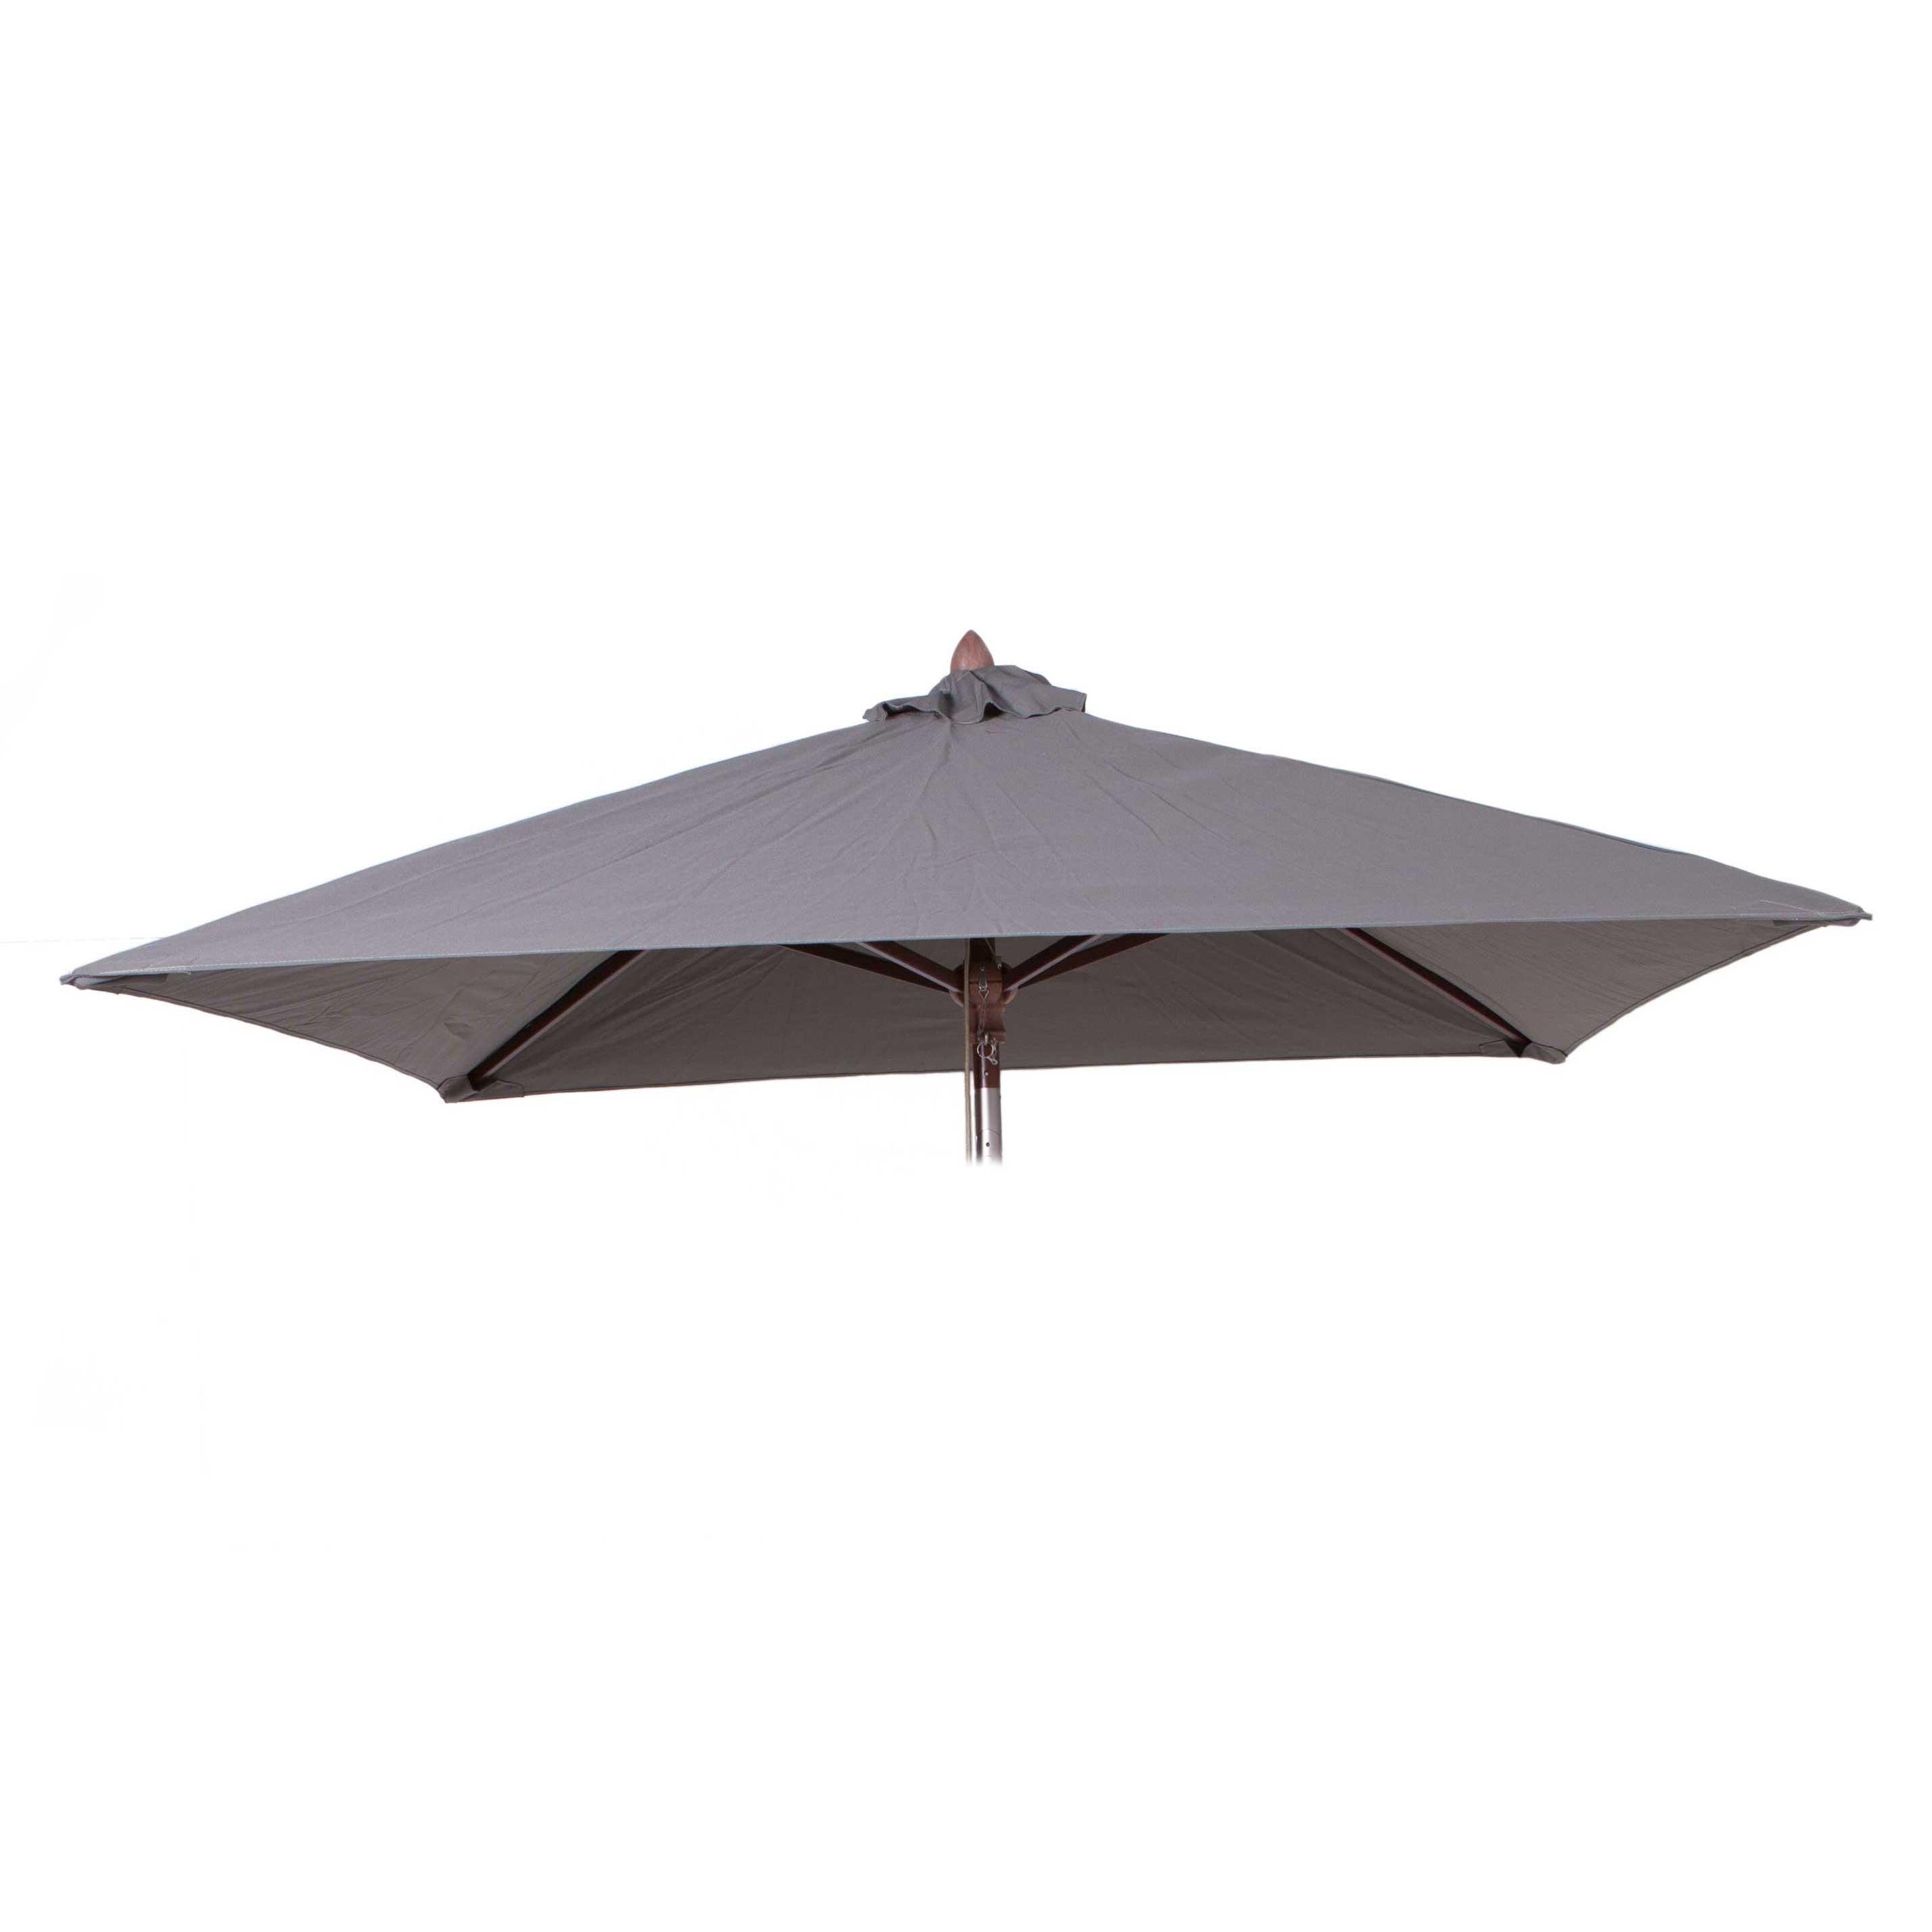 Parasoldoek Borek 200x200cm vierkant grijs (olefin)